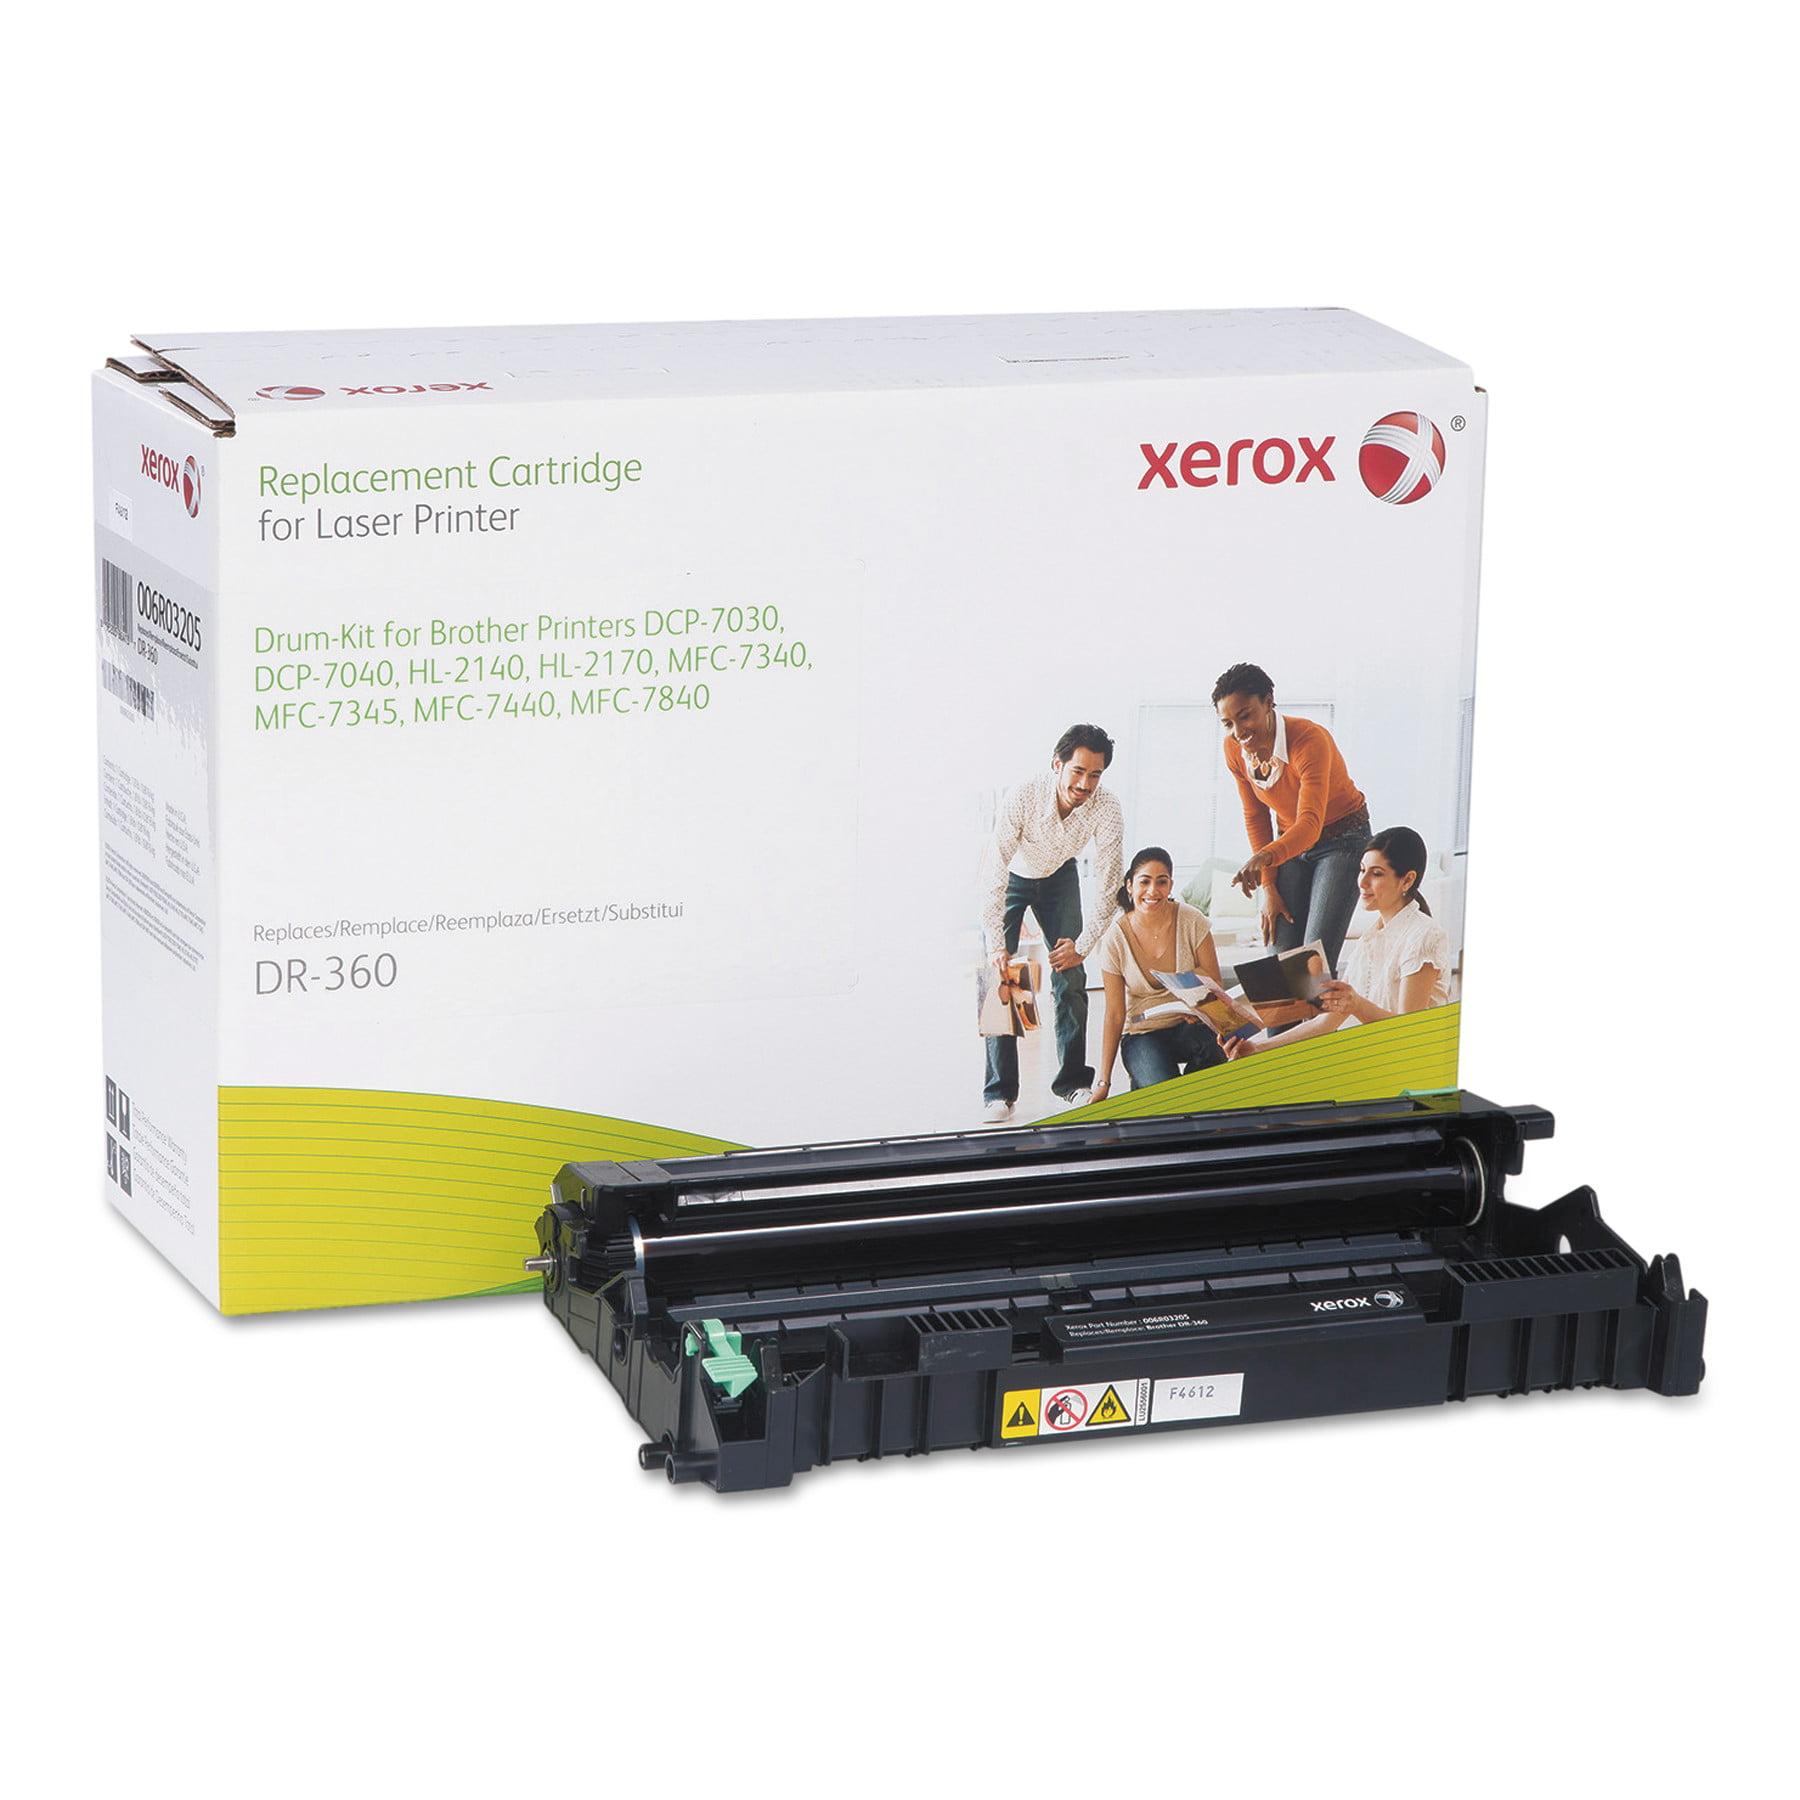 Xerox 006R03205 Remanufactured DR360 Drum Unit